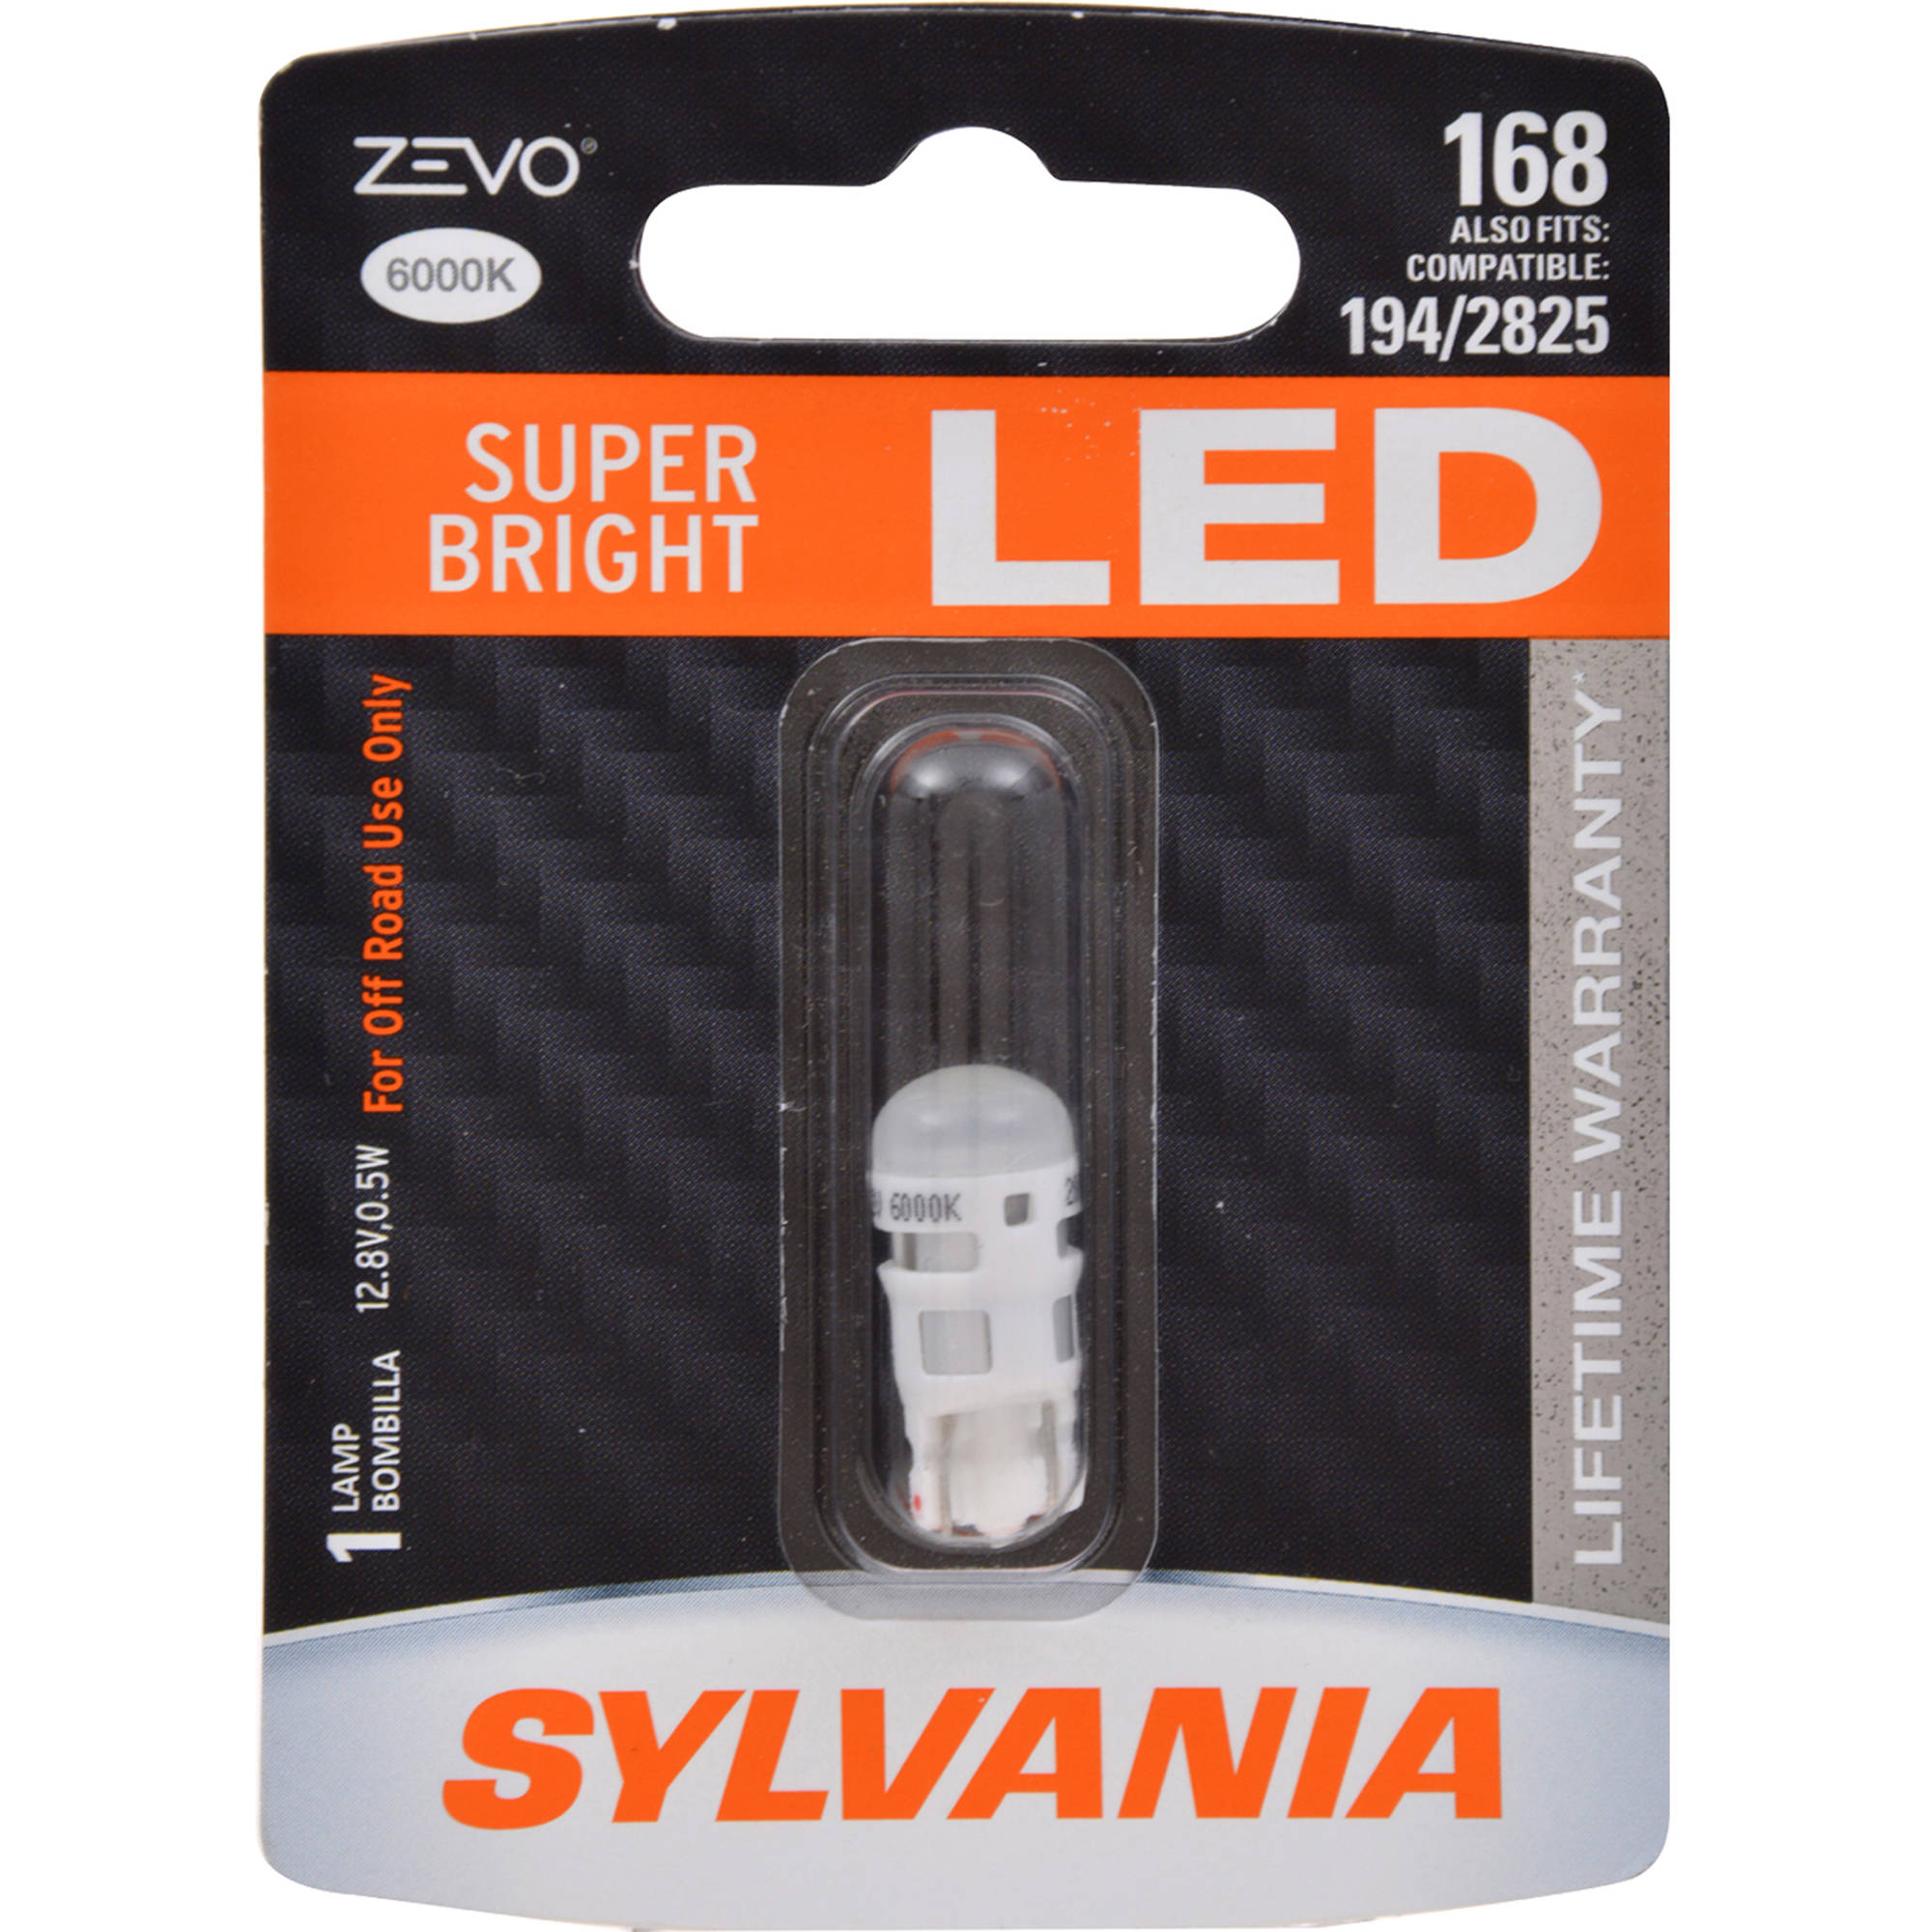 . Sylvania 168 ZEVO LED Bulb   Walmart com